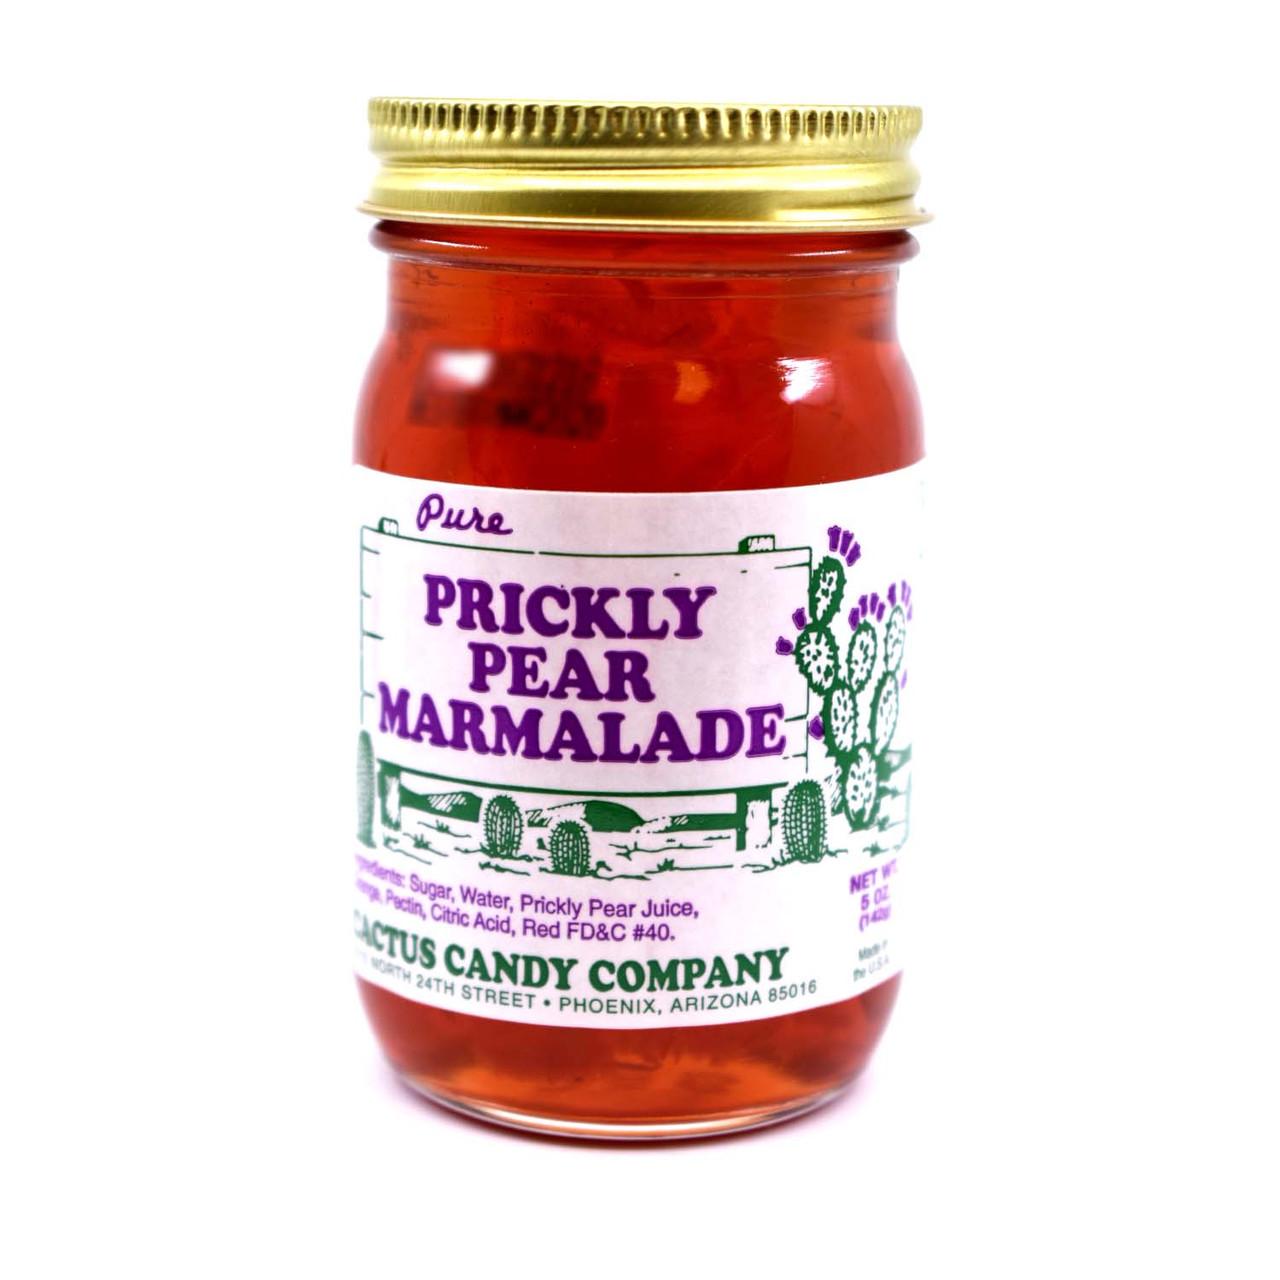 Prickly Pear Maramalade 5oz Glass Jar